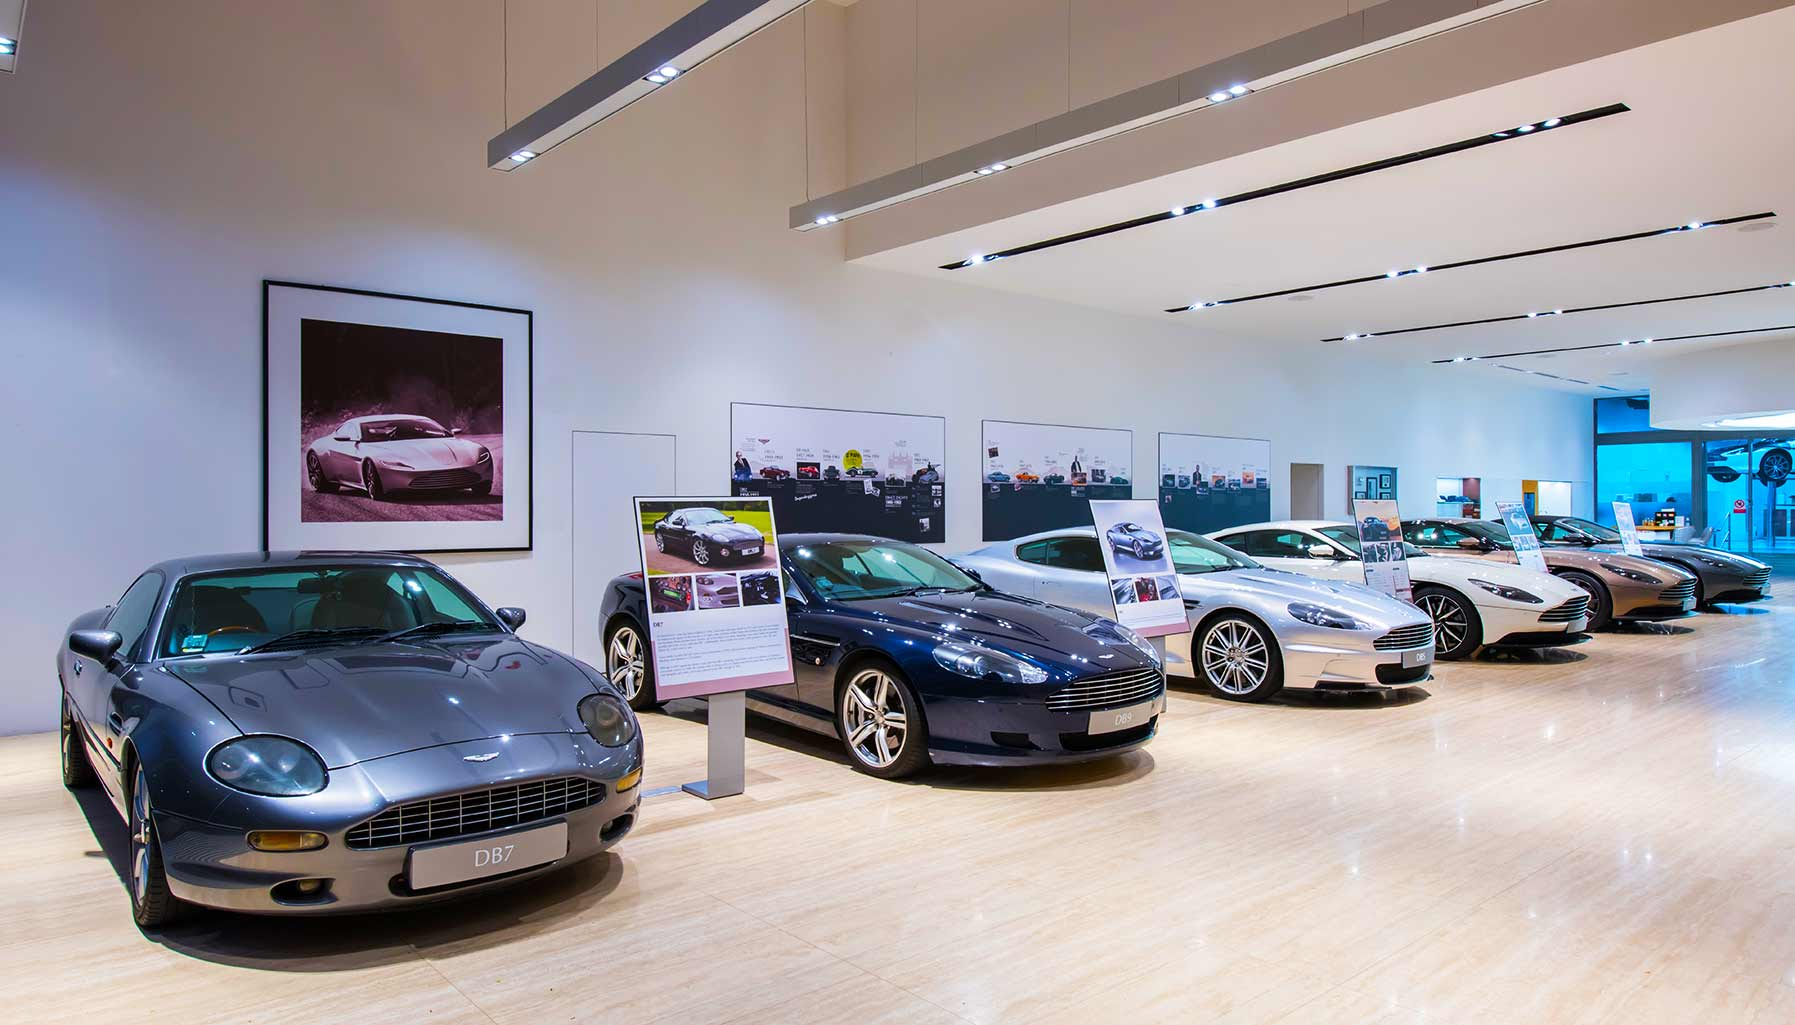 Aston Martin Singapore Showroom, Aston Martin DB